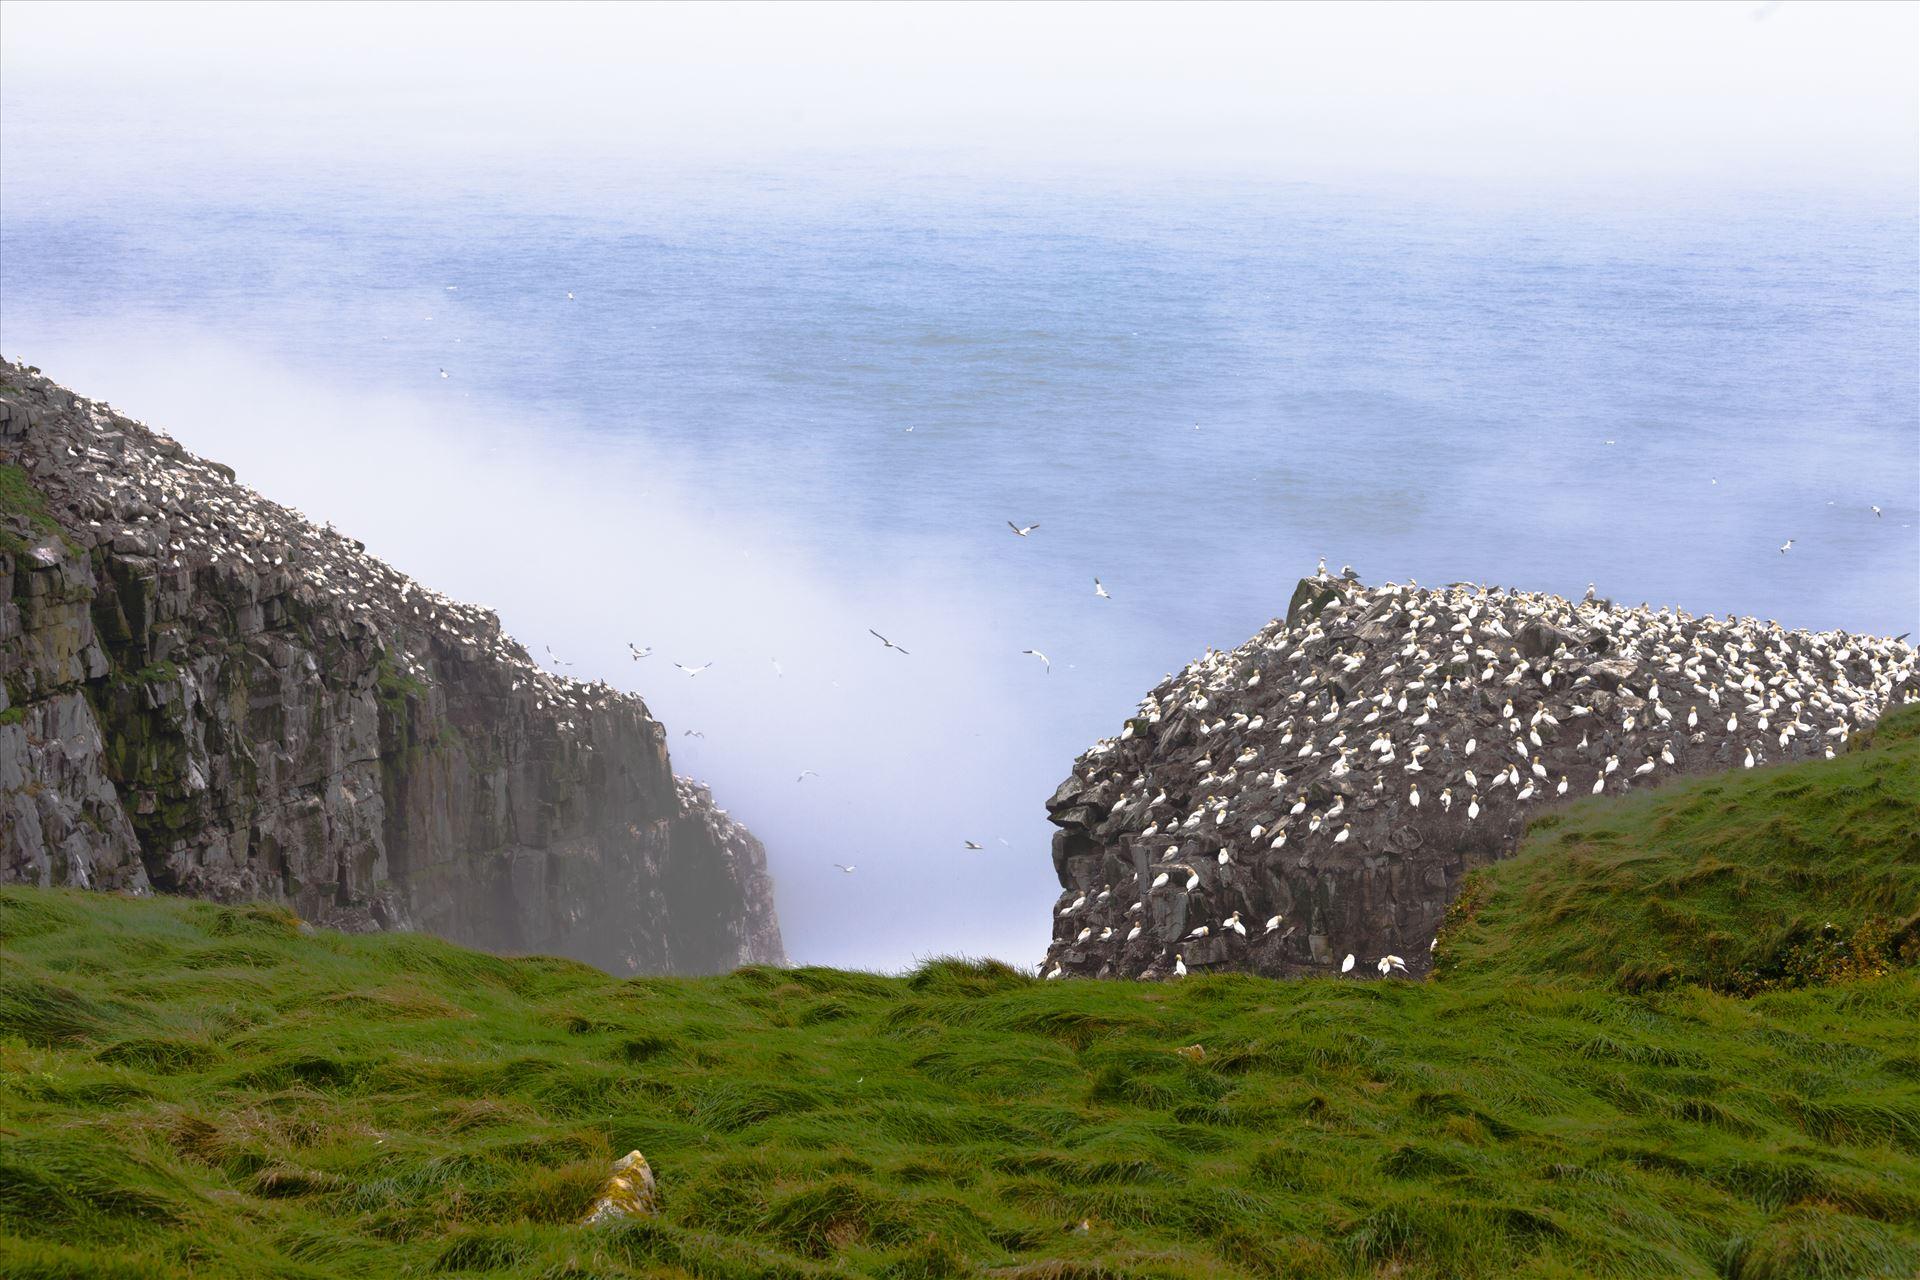 Colony of breeding Northern Gannets, Morus bassanus, on Cape St Marys, Newfoundland, NL, Canada Colony of breeding Northern Gannets, Morus bassanus, on Cape St Marys, Newfoundland, NL, Canada by Imago Borealis